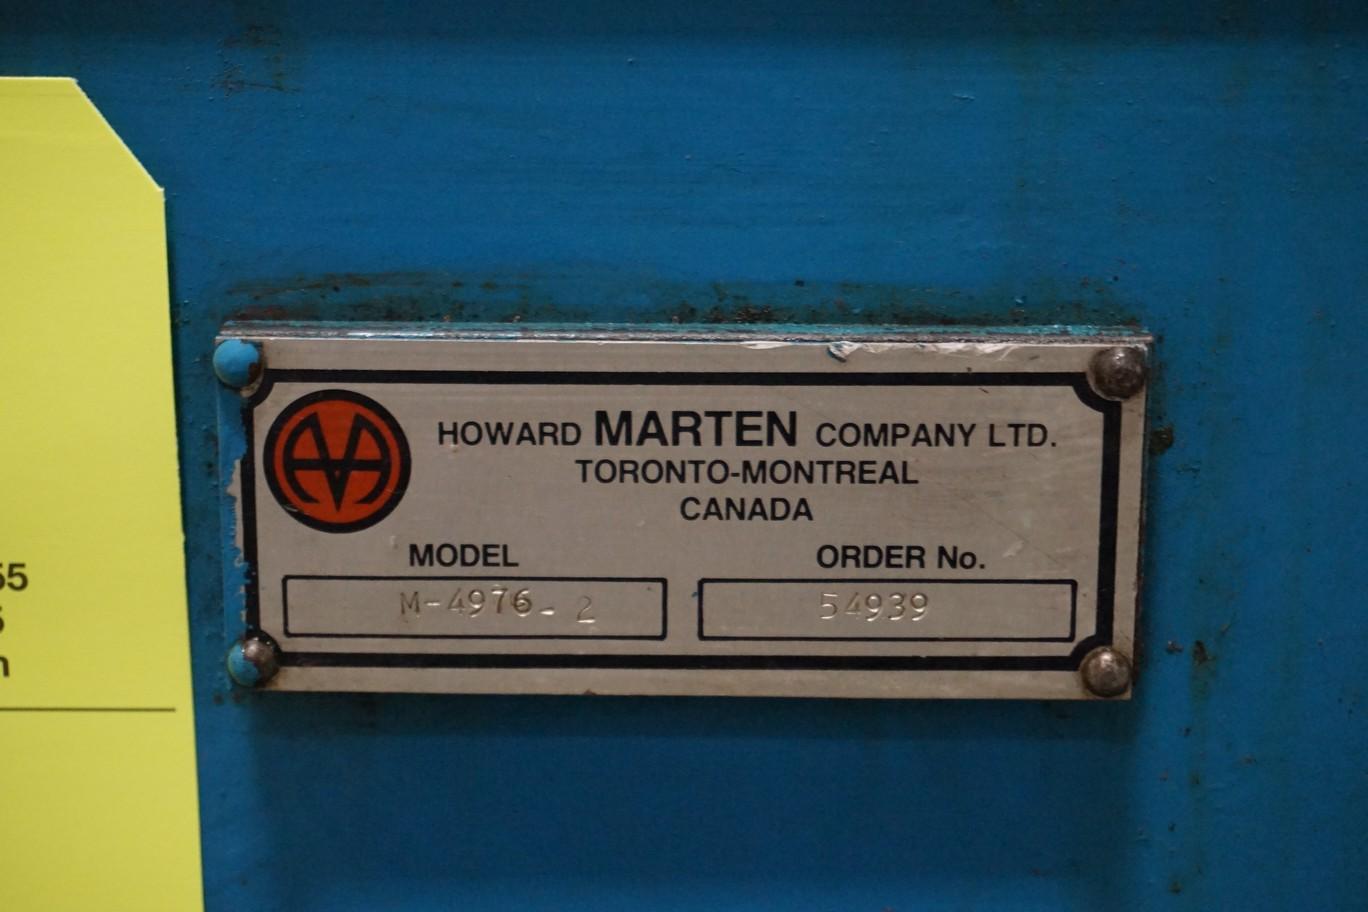 Marten Model M4976-2 Hydraulic Power Pack - Image 2 of 2